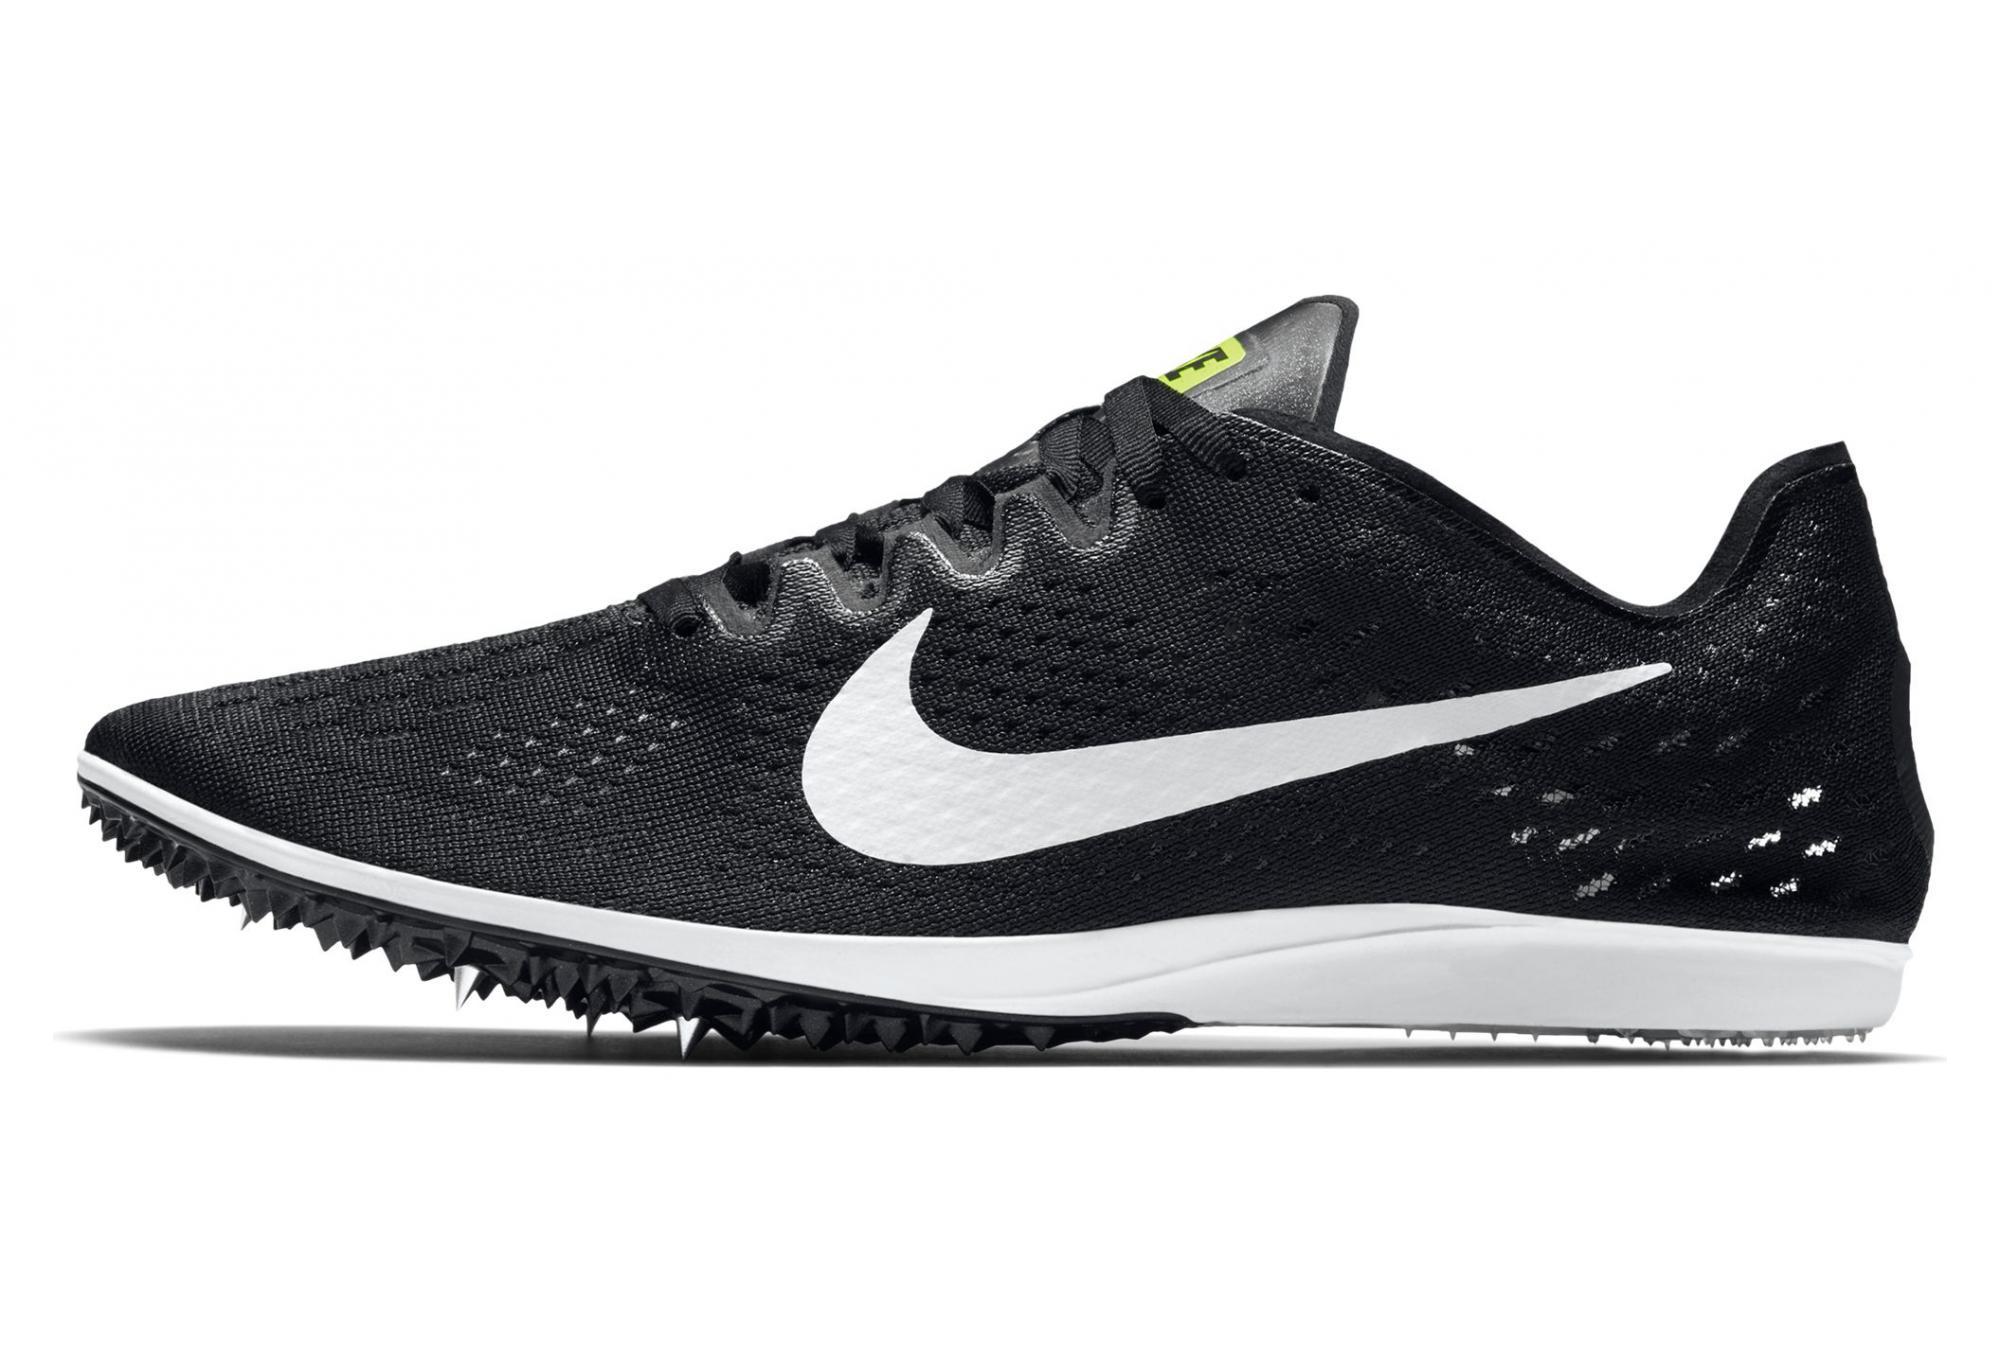 online store 9a3e5 14f24 Nike Zoom Matumbo 3 Black White Unisex